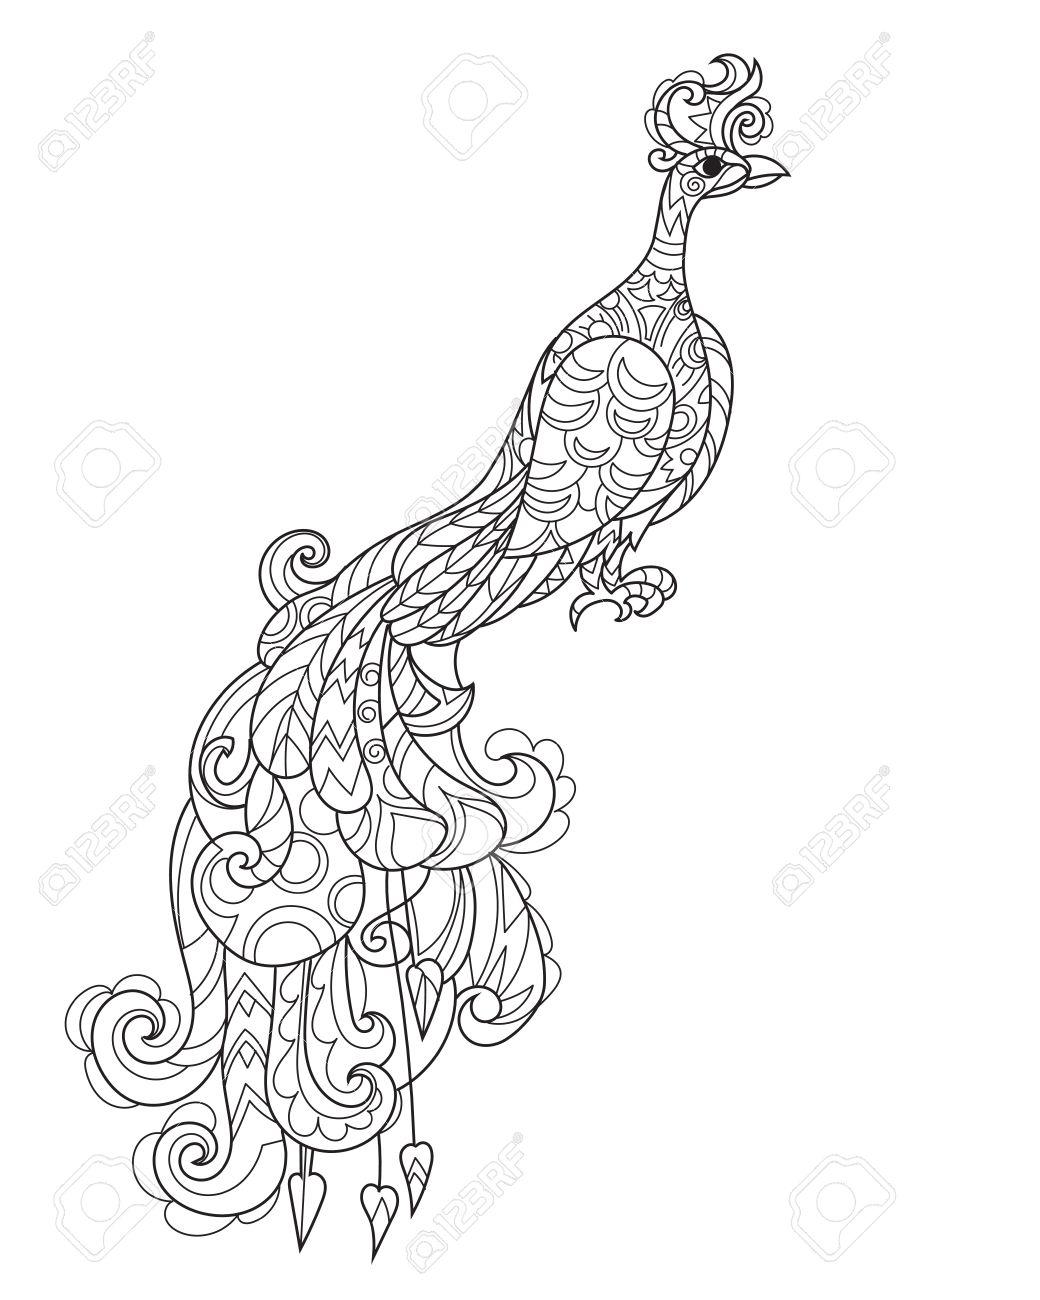 1040x1300 Zen Art Stylized Peacock In Flowers. Hand Drawn Doodle Boho Vector